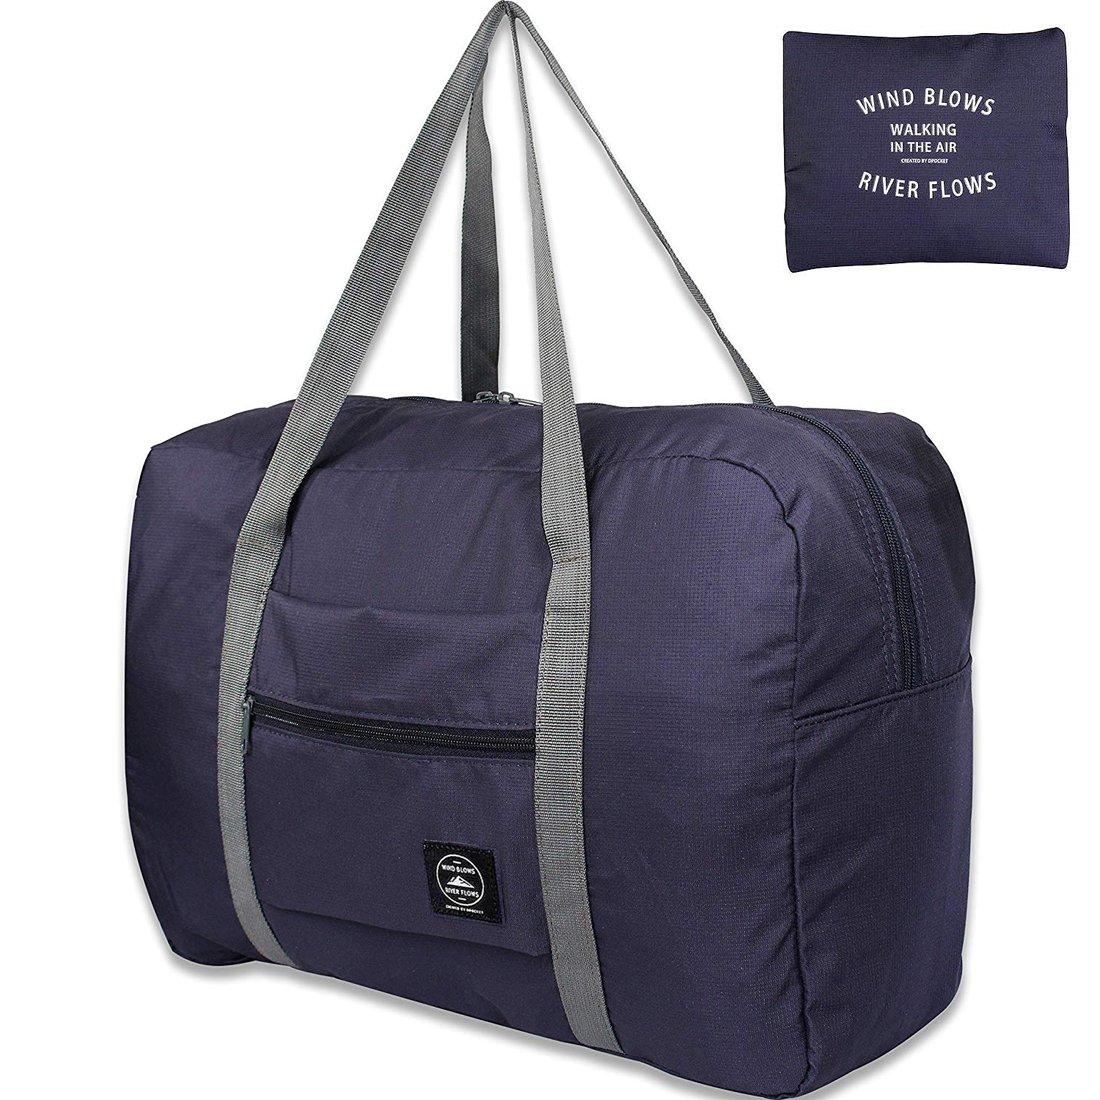 Unova Travel Duffel Bag Packable Light Nylon Water Resistant Gym Tote Weekend Overnight Carry-on Shoulder Bag (Nvay Blue)